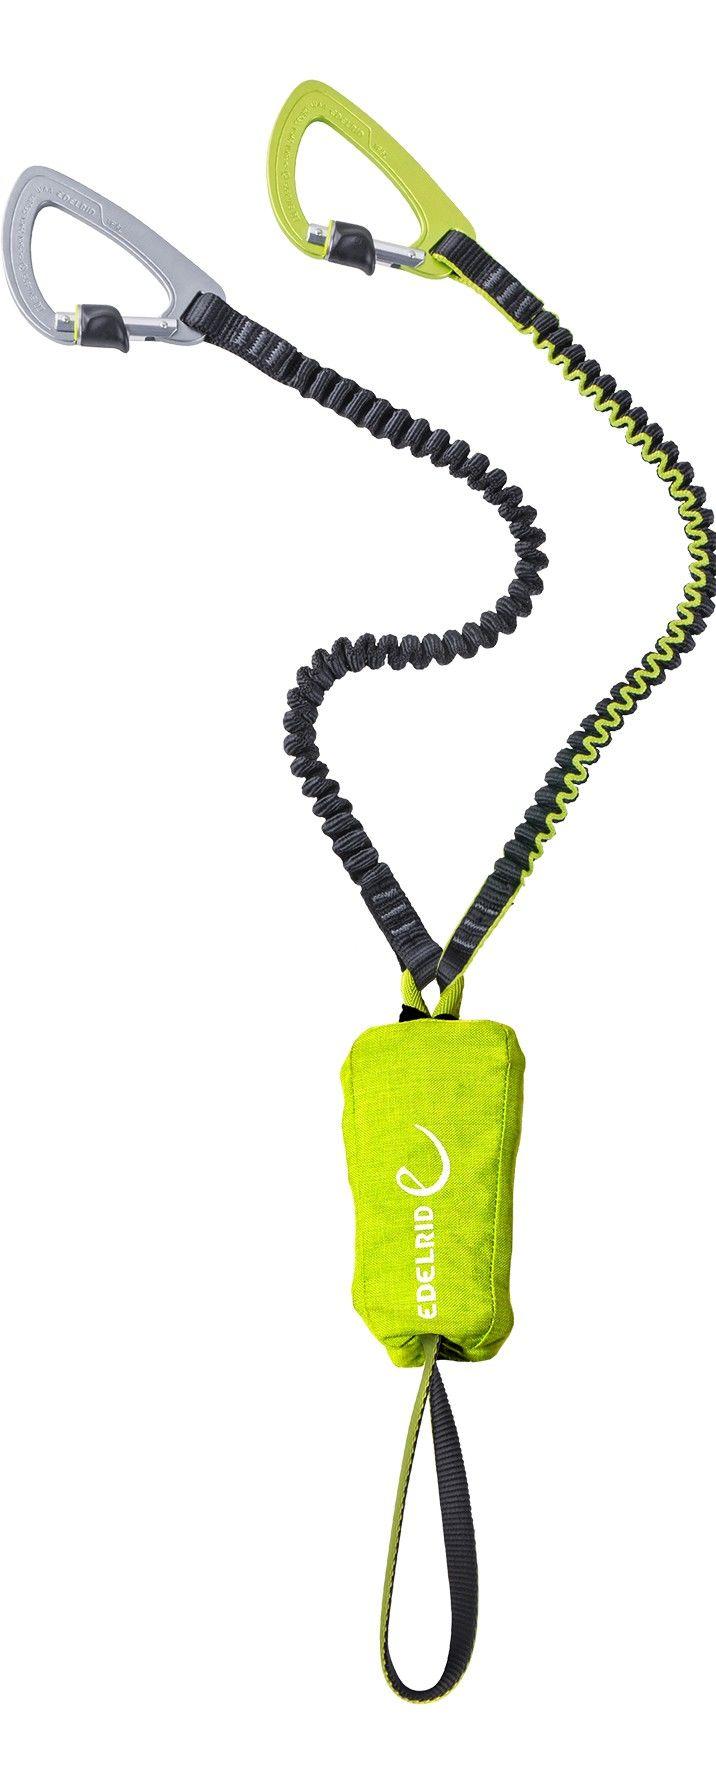 Edelrid Cable KIT Ultralite 5.0 | Größe One Size |  Klettersteig-Ausrüstung